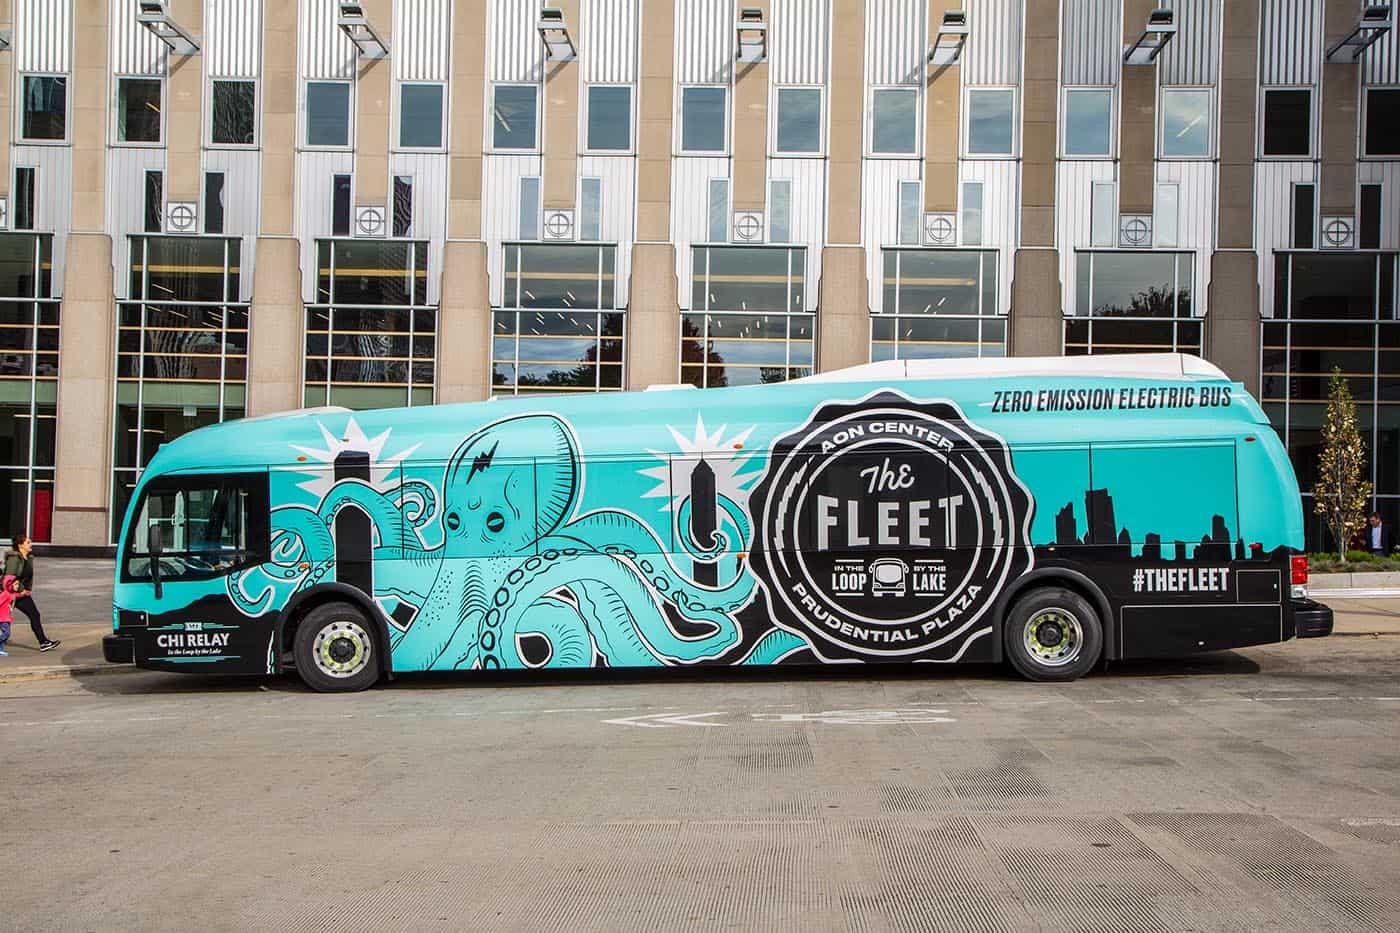 The Fleet Bus1